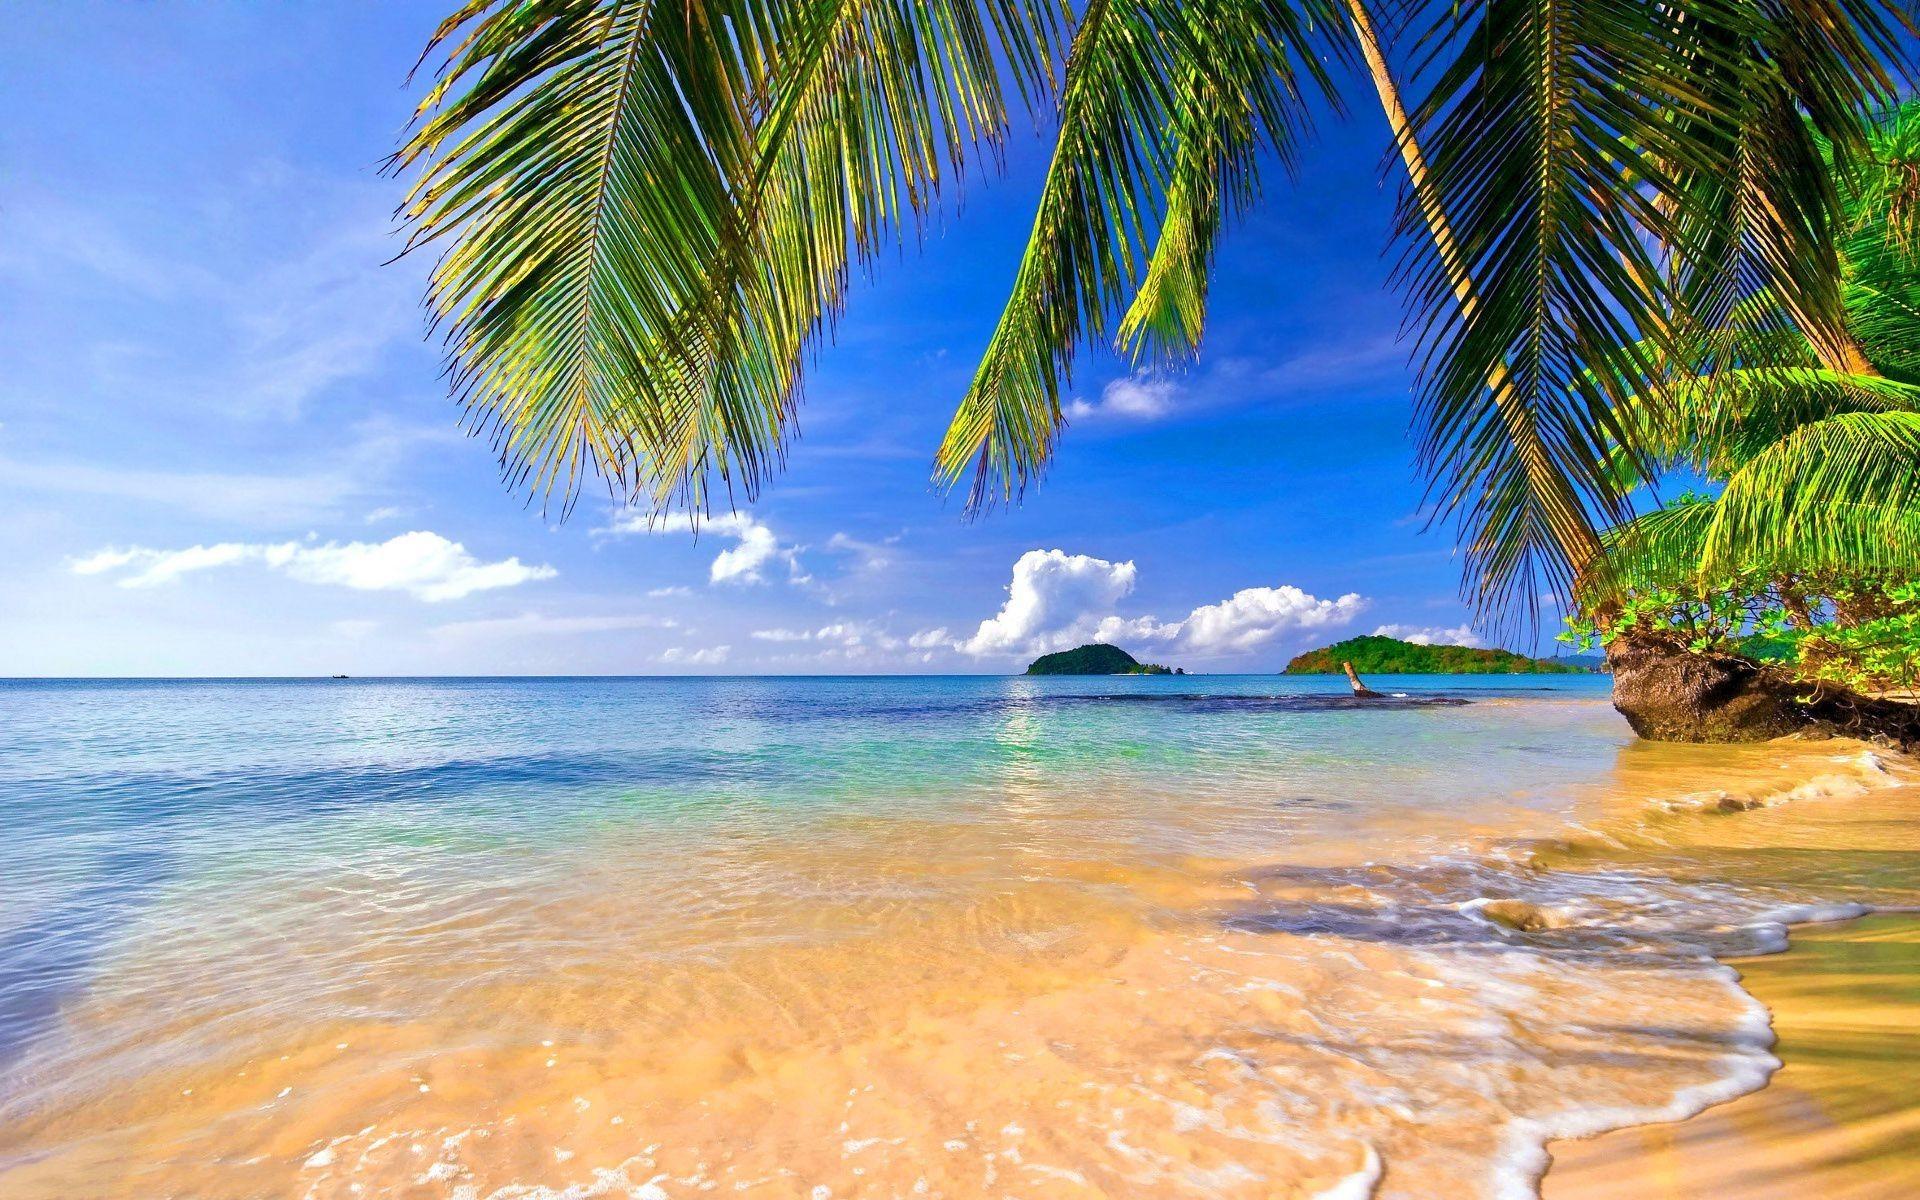 Hd Tropical Island Beach Paradise Wallpapers And Backgrounds: Tropical Beach HD Wallpaper (68+ Images